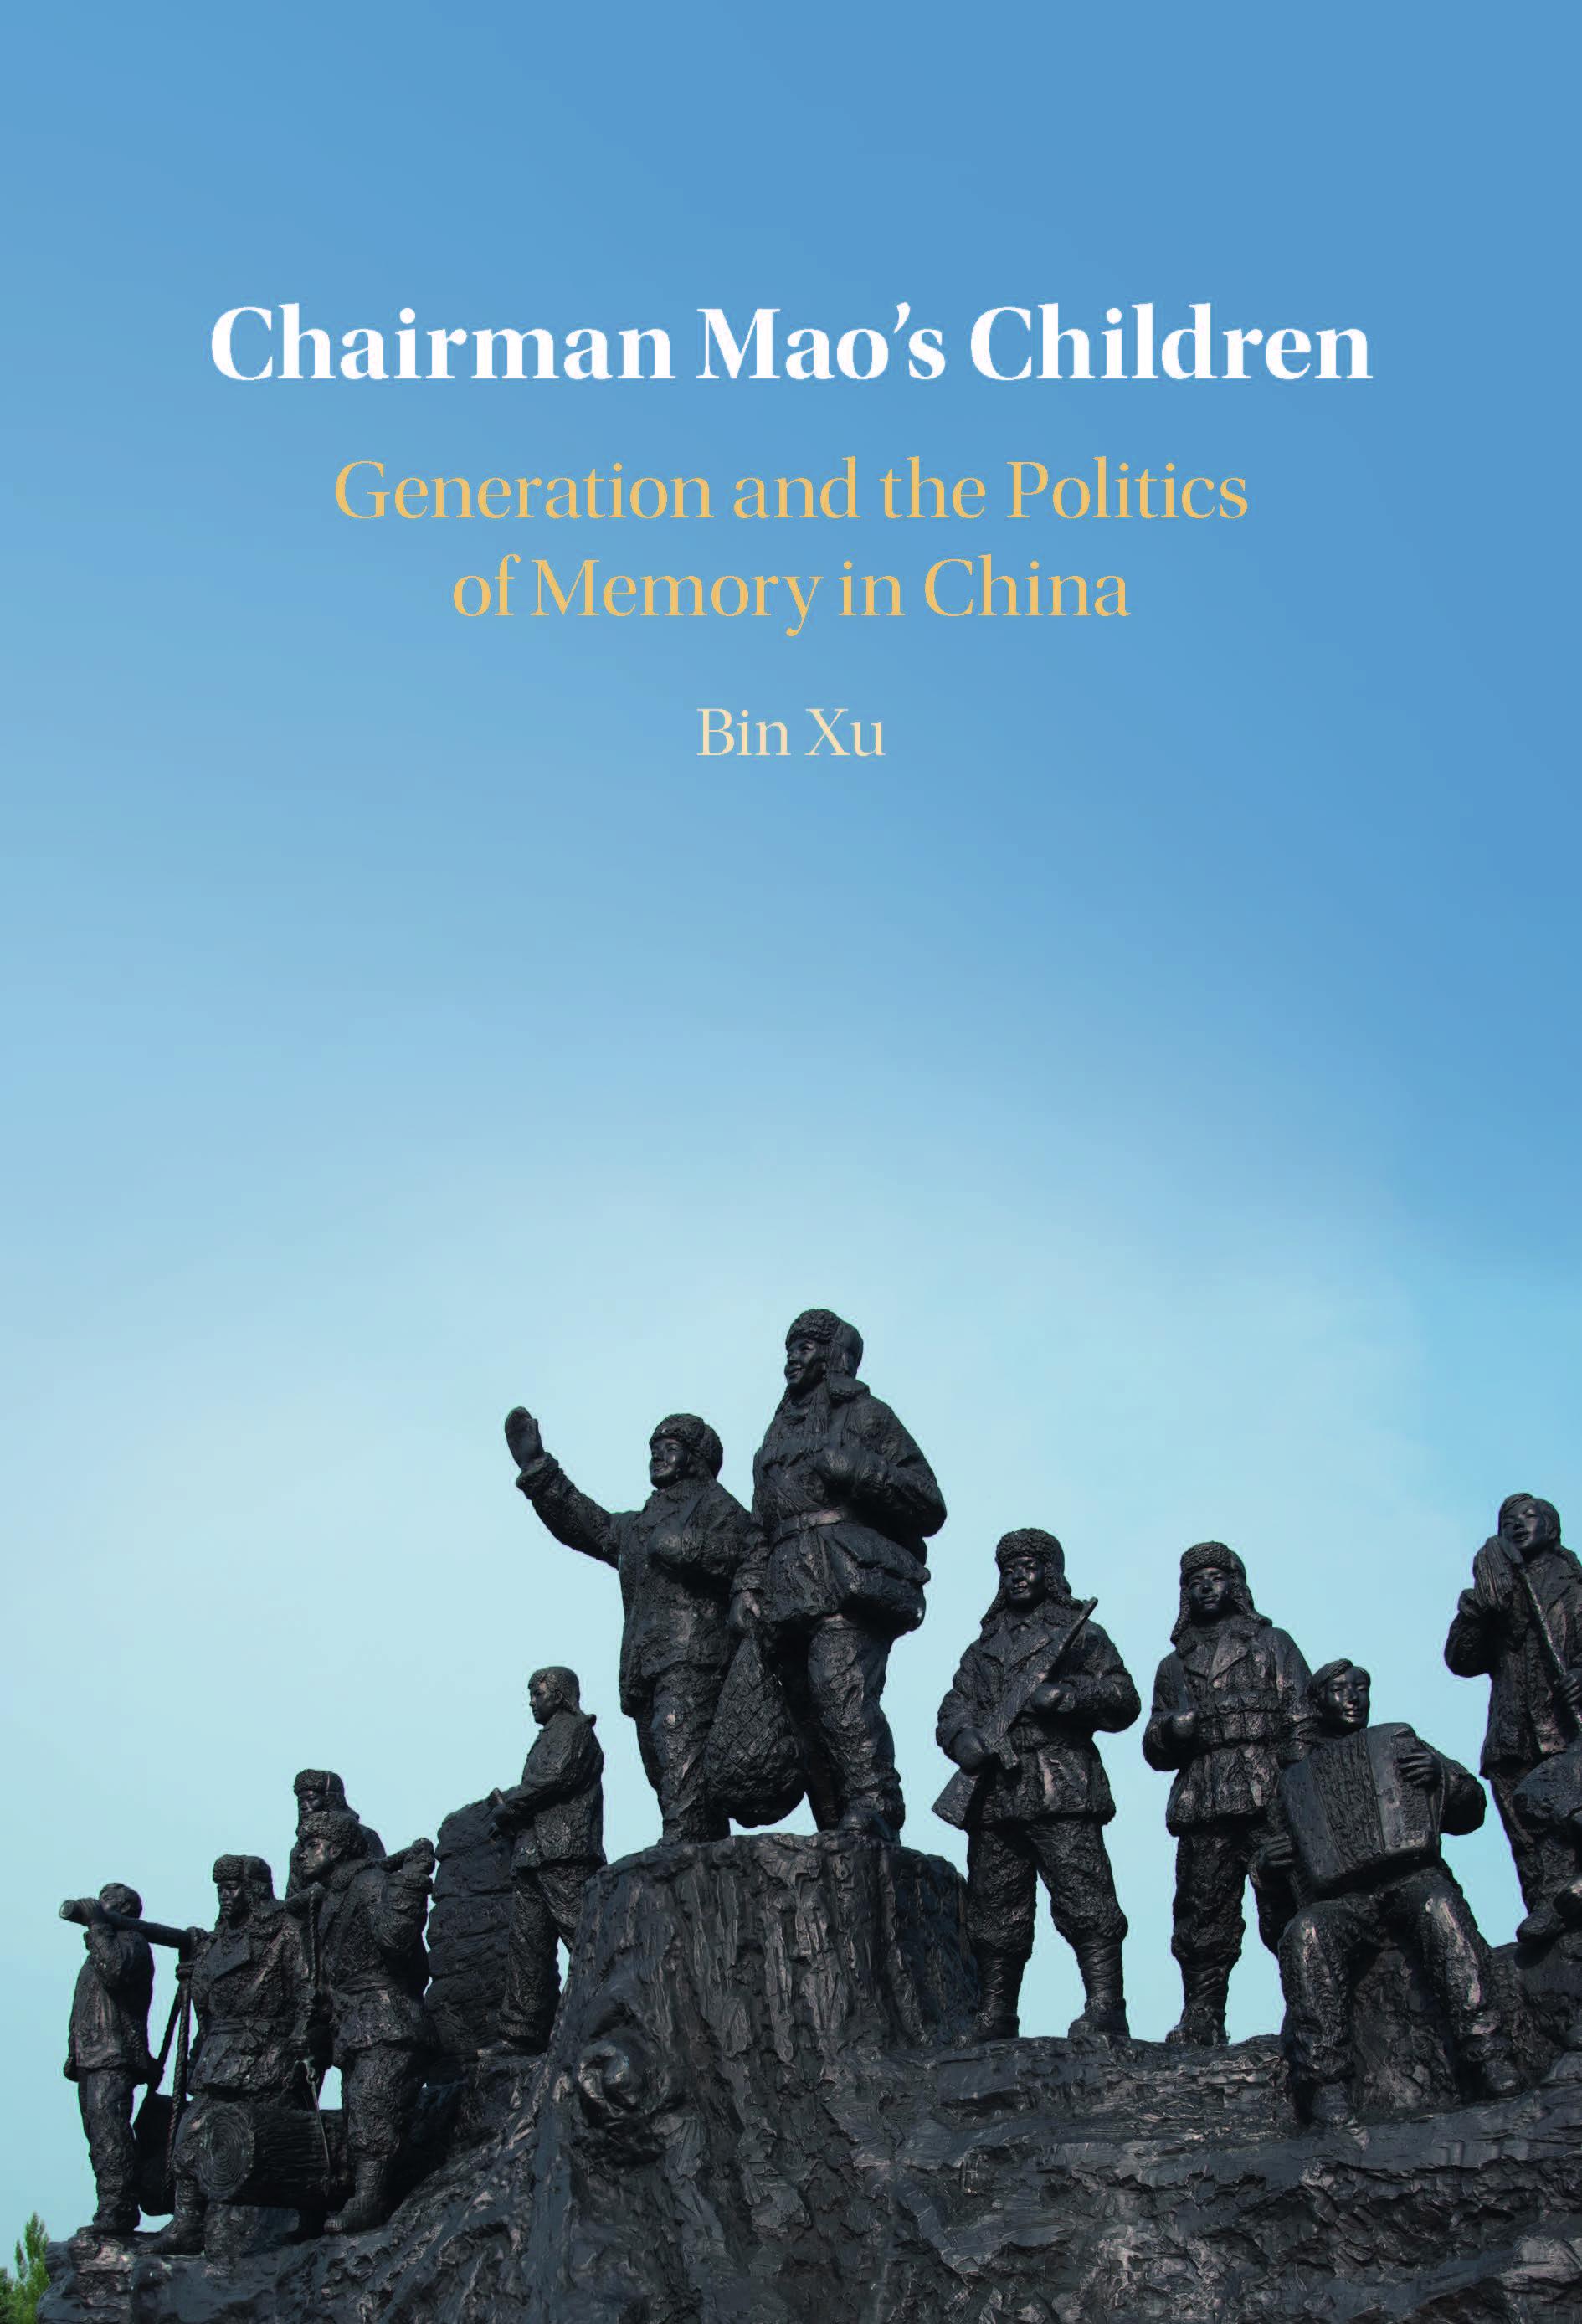 Chairman Mao's Children_cover